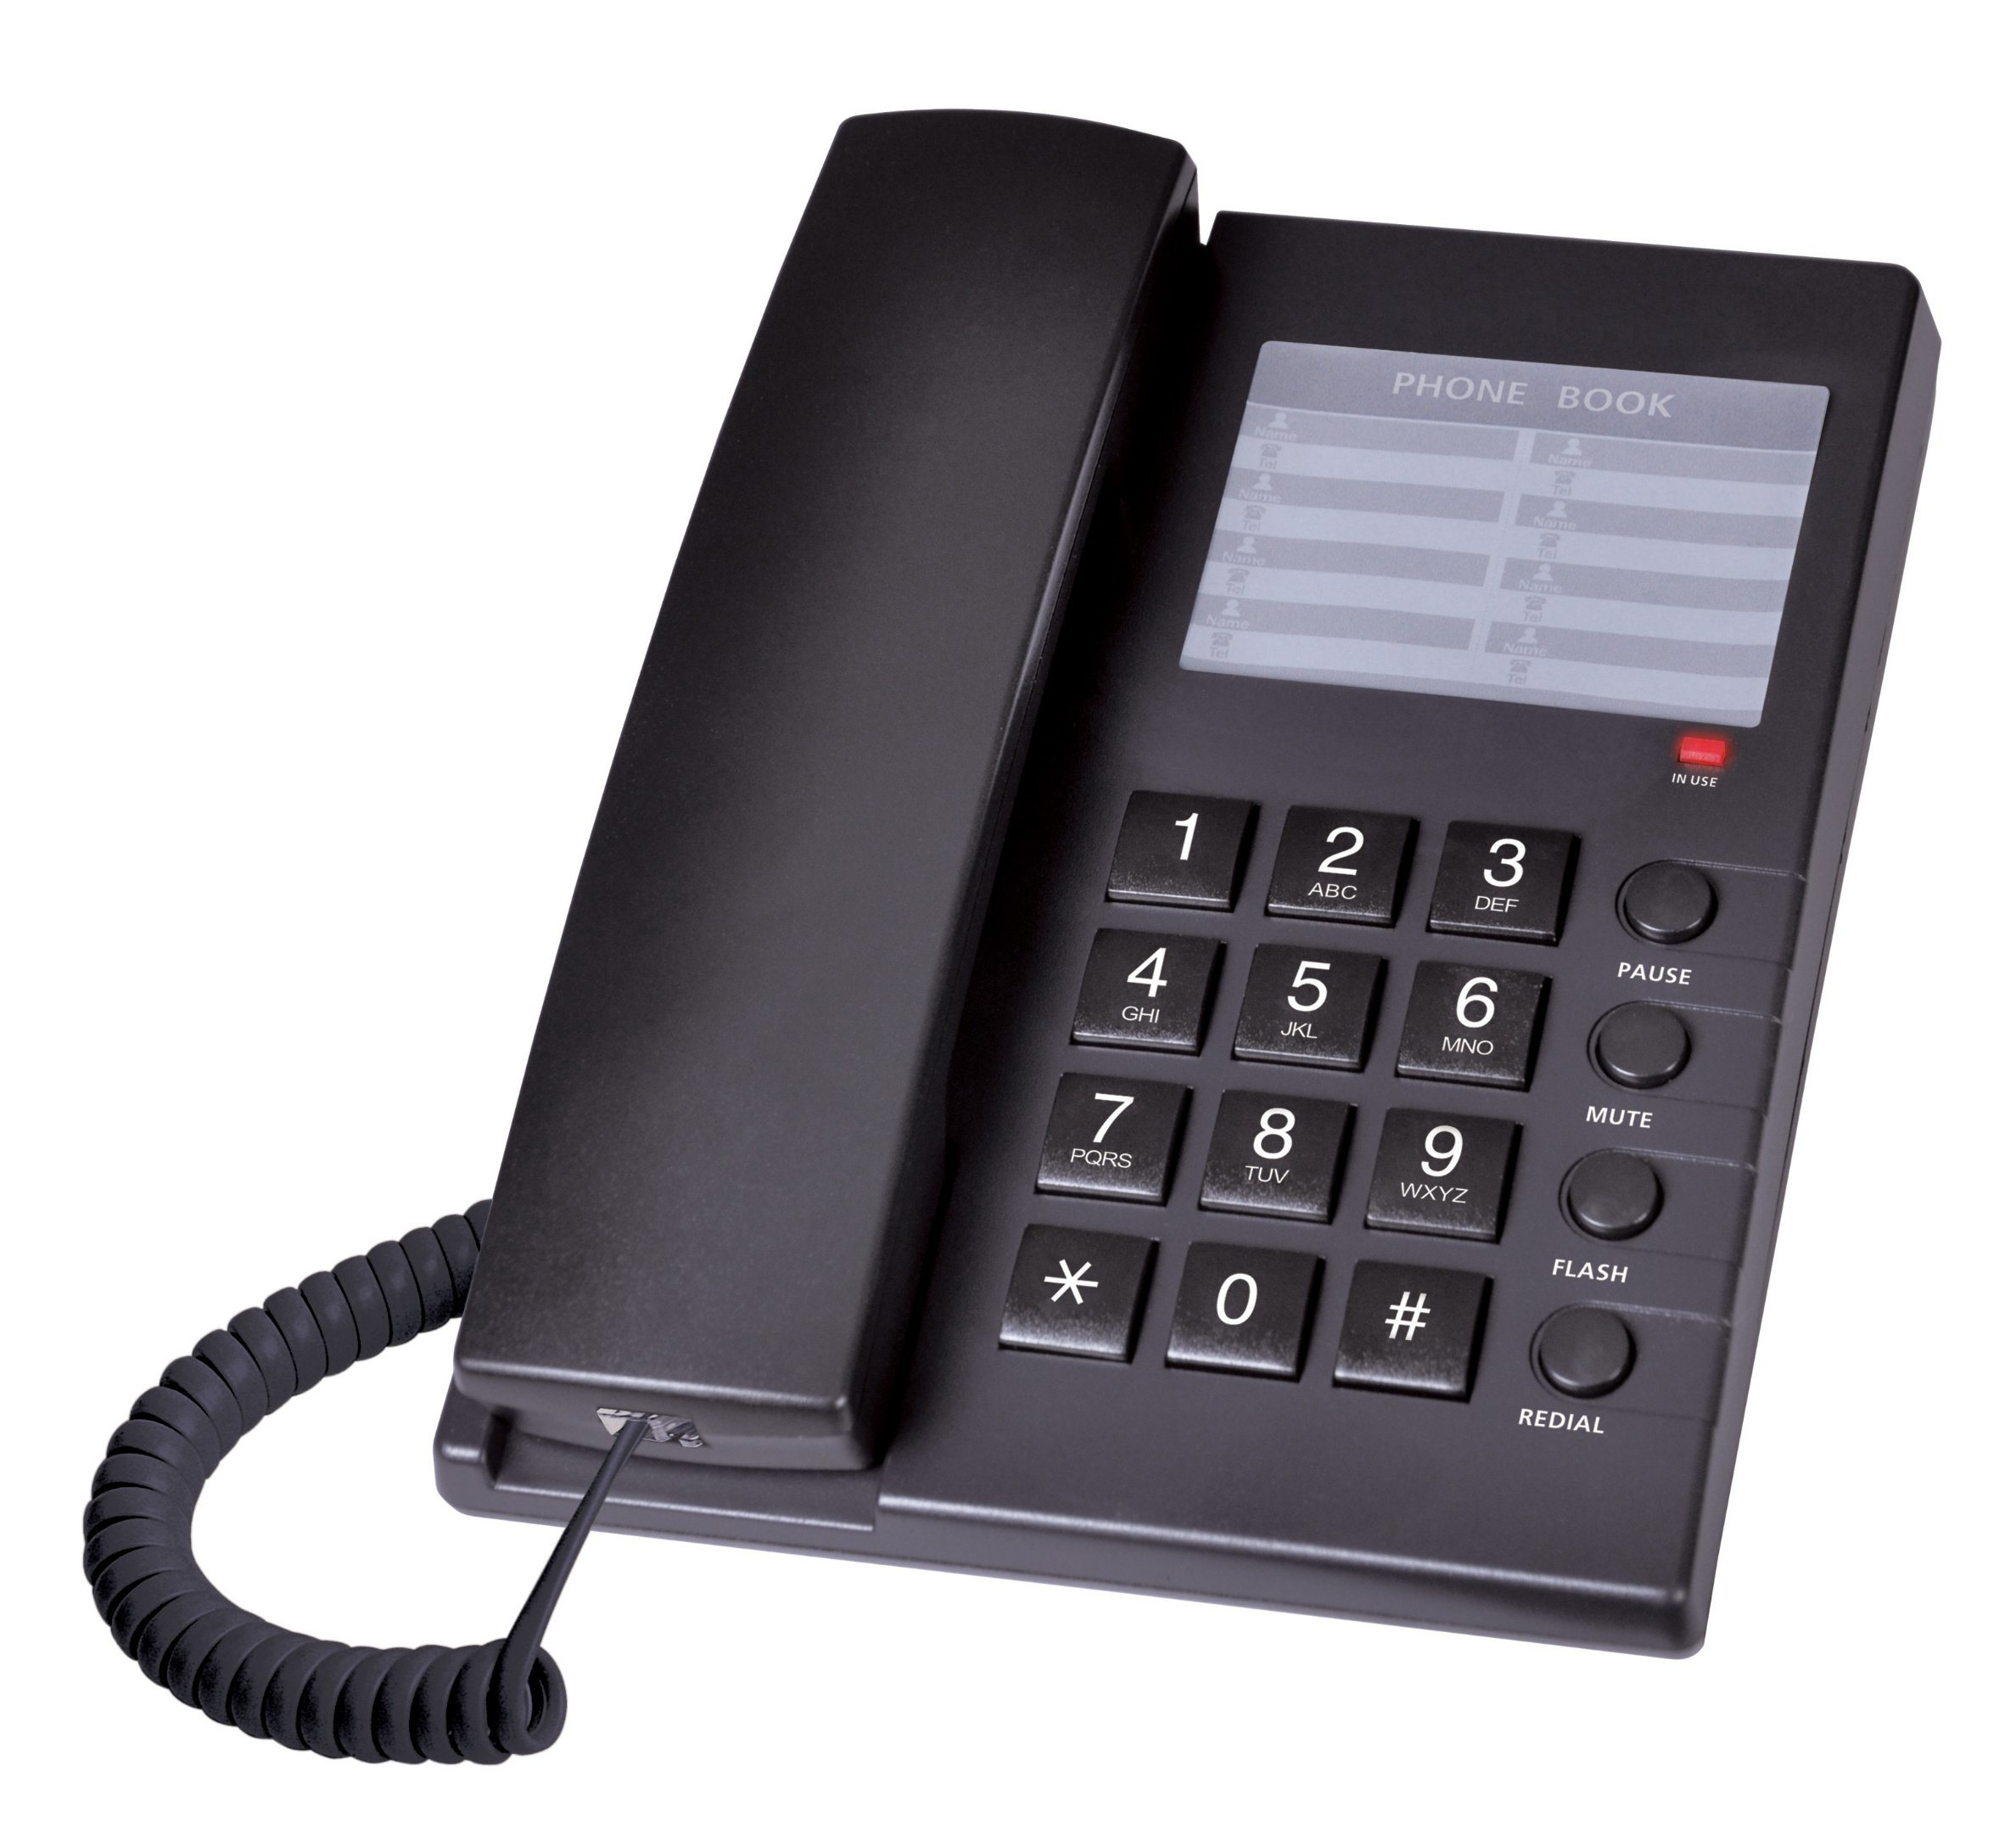 Corded Telephone, Desktop Phone, Office Phone, Hotel Telephone, Landline Telephone